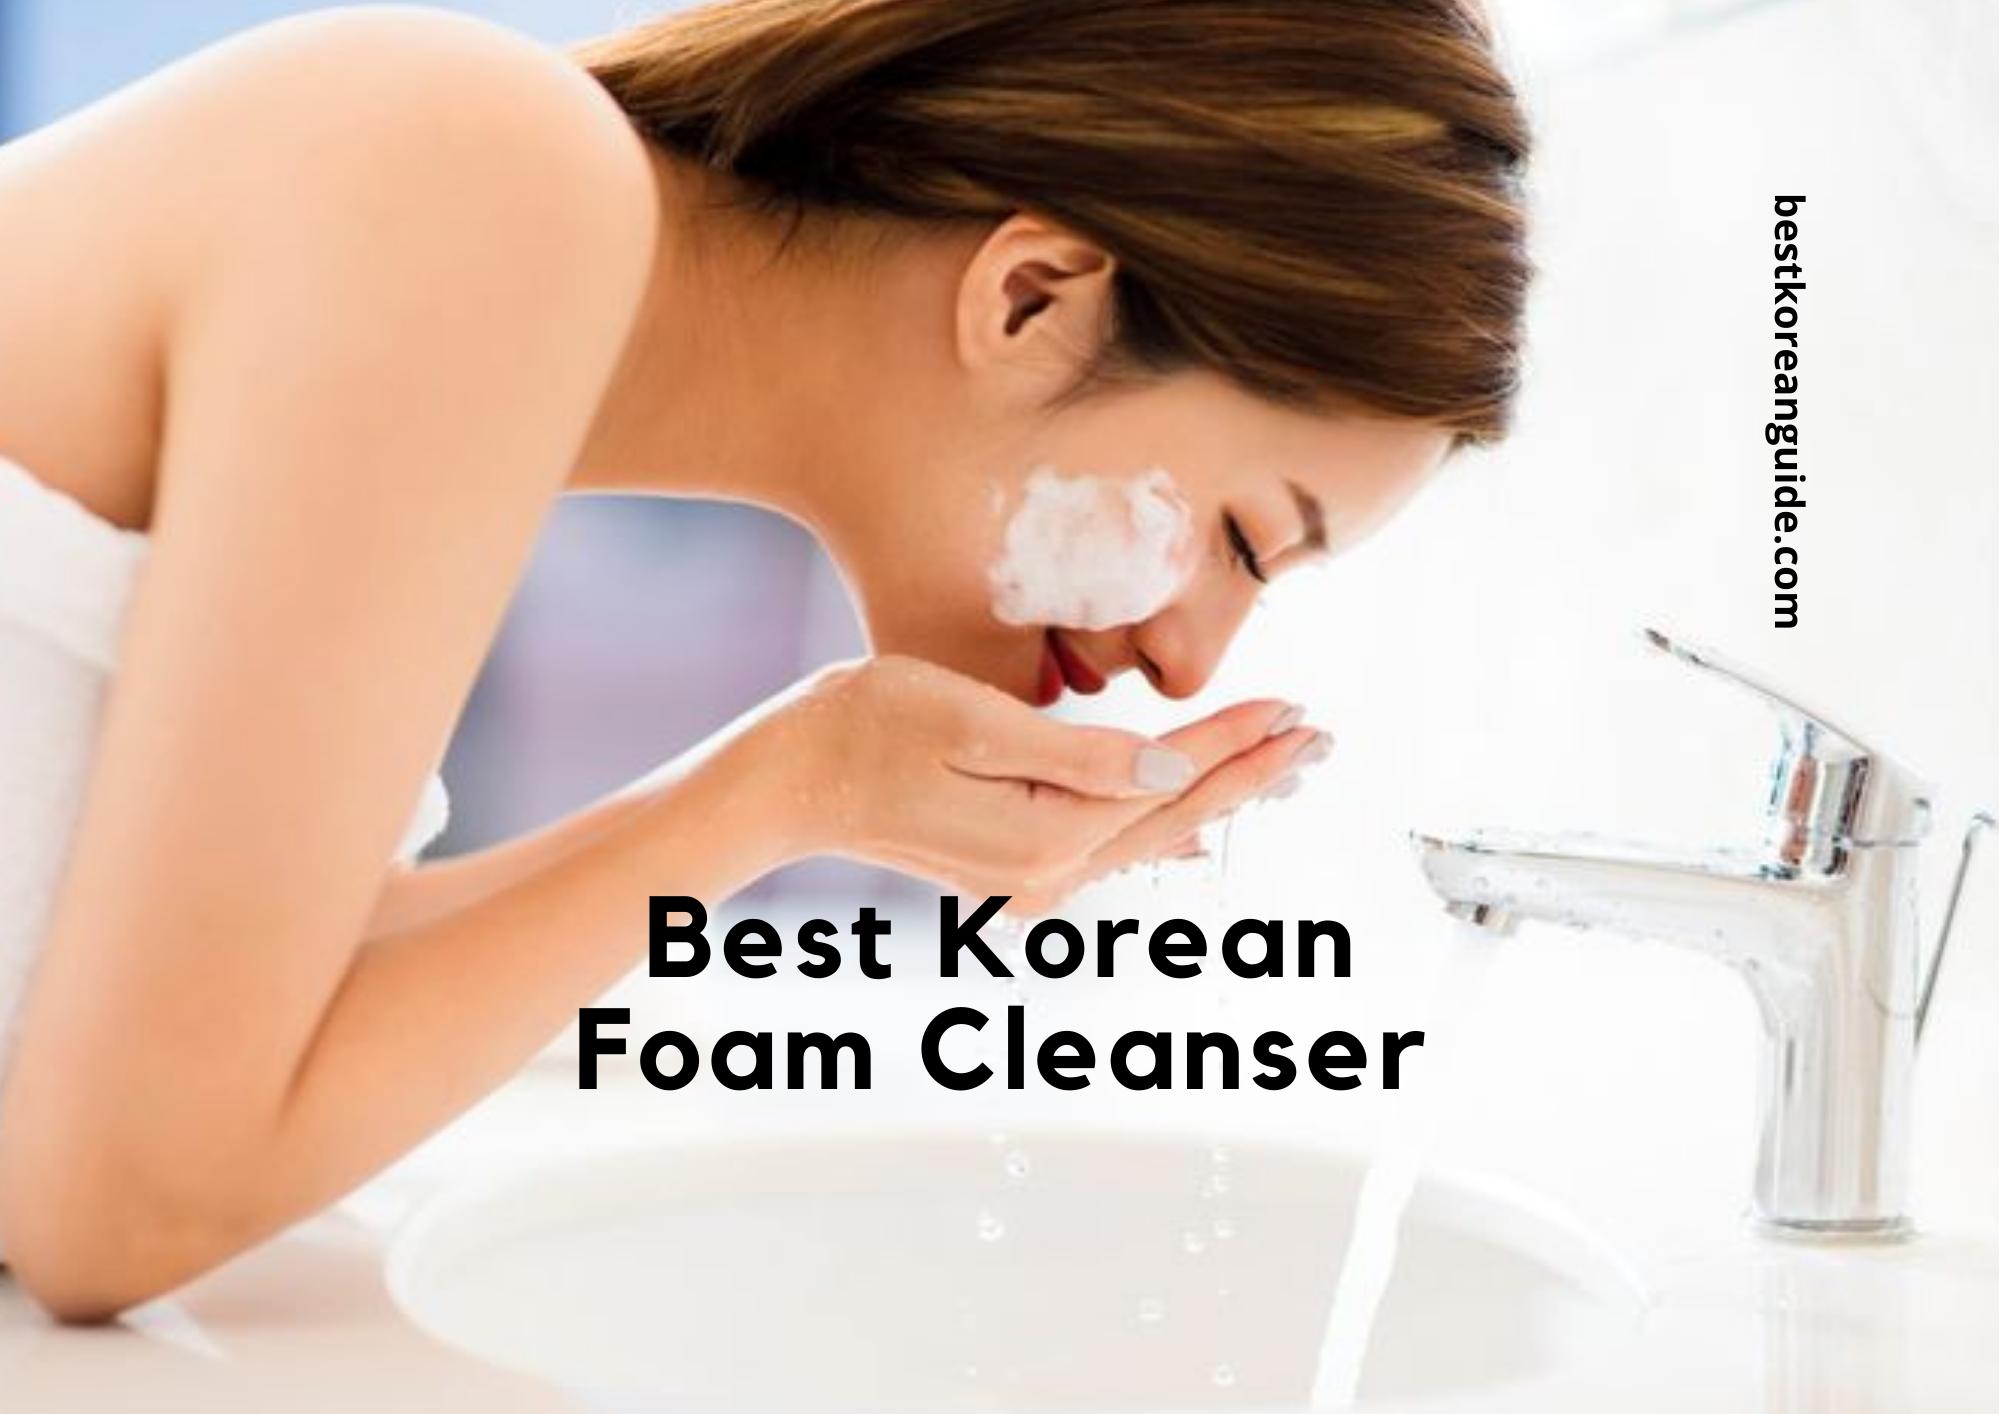 Best Korean Foam Cleanser